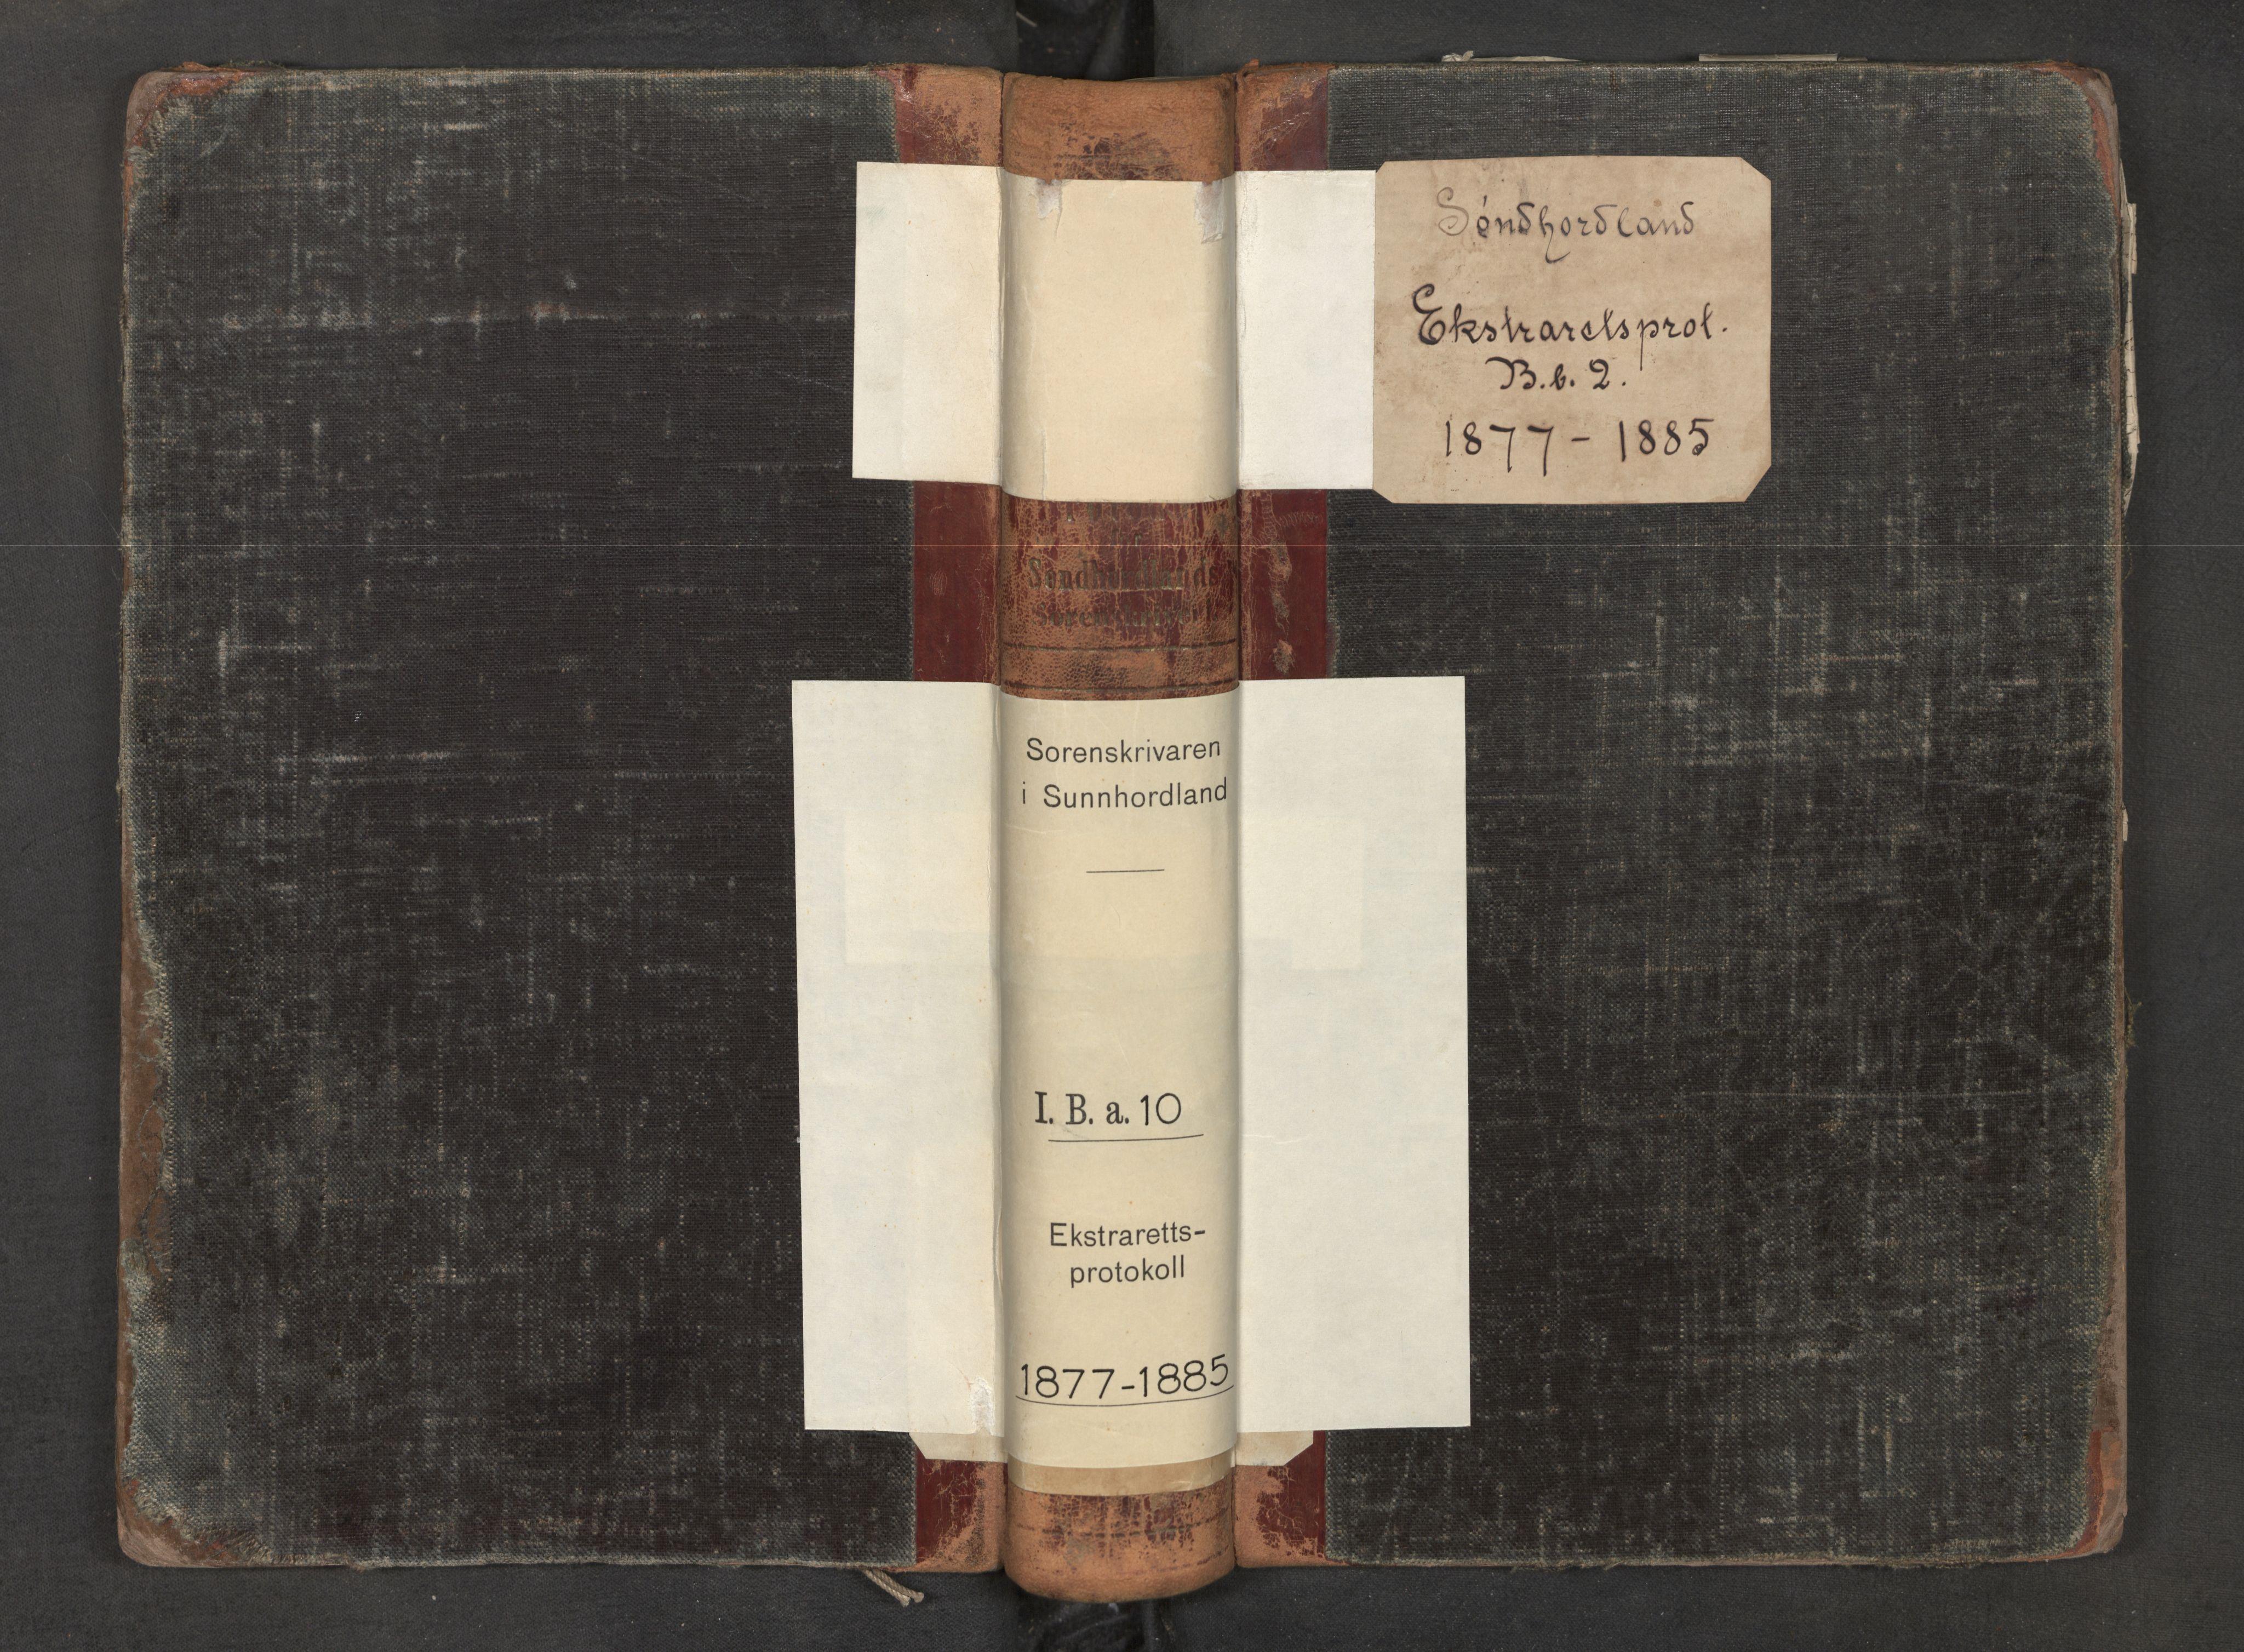 SAB, Sunnhordland sorenskrivar, F/Fb/Fba/L0010: Ekstrarettsprotokoll, 1877-1885